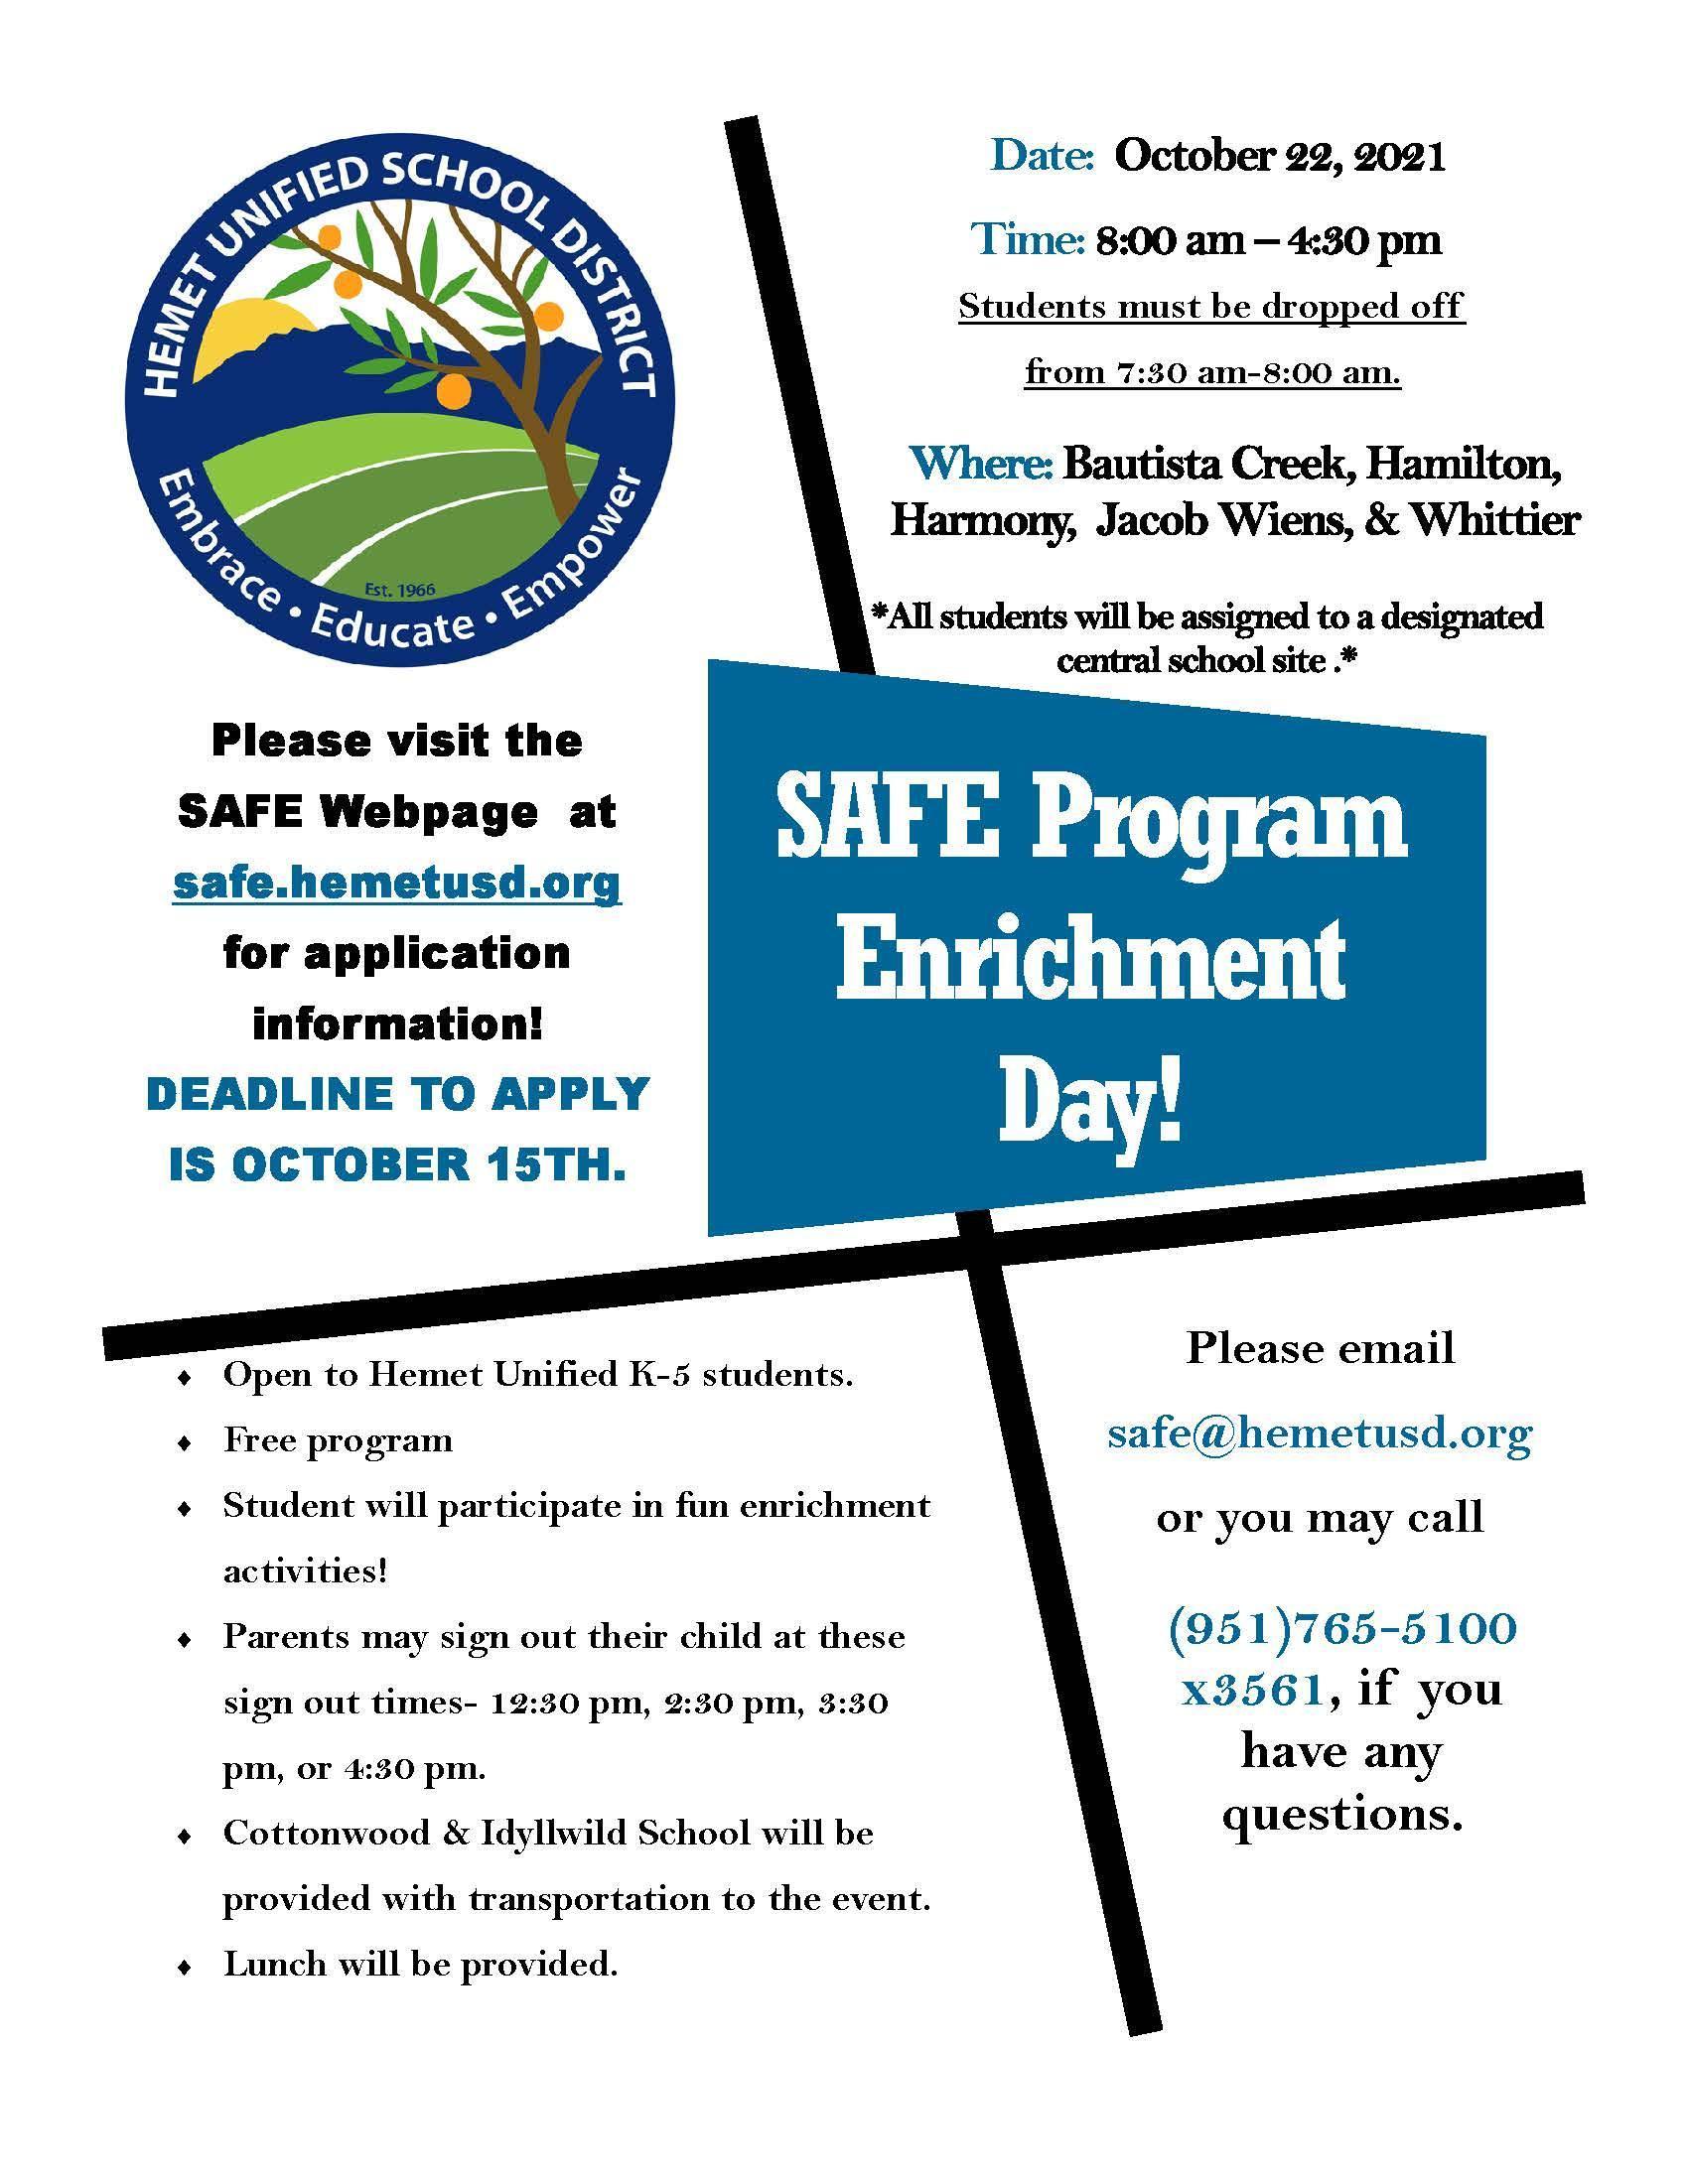 SAFE Oct 22 Enrichment Day